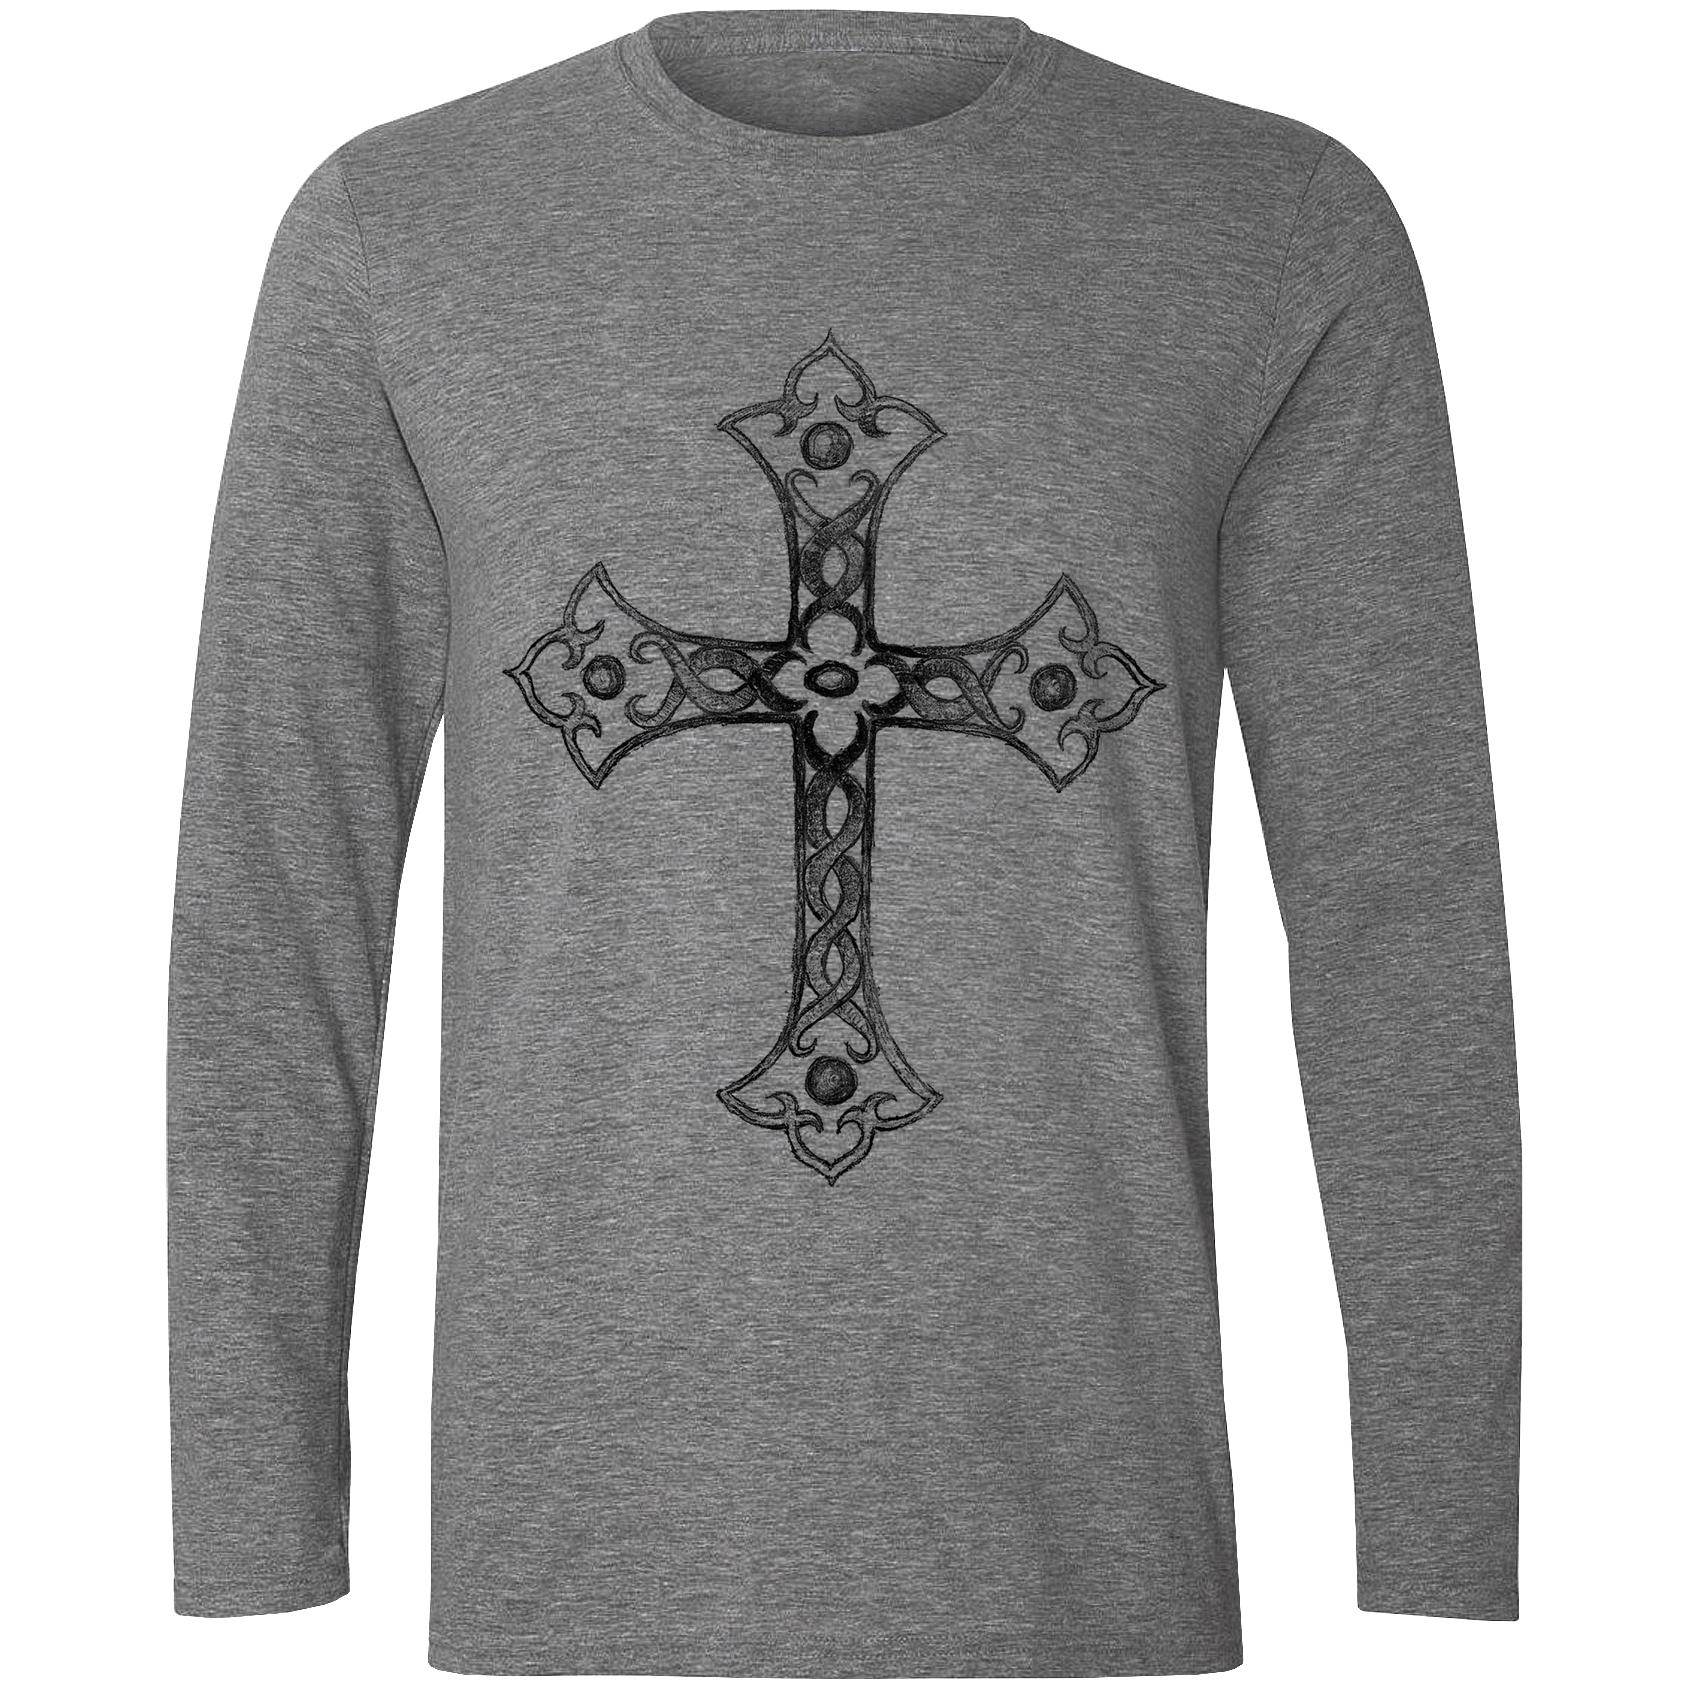 تیشرت آستین بلند مردانه طرح صلیب کد S365